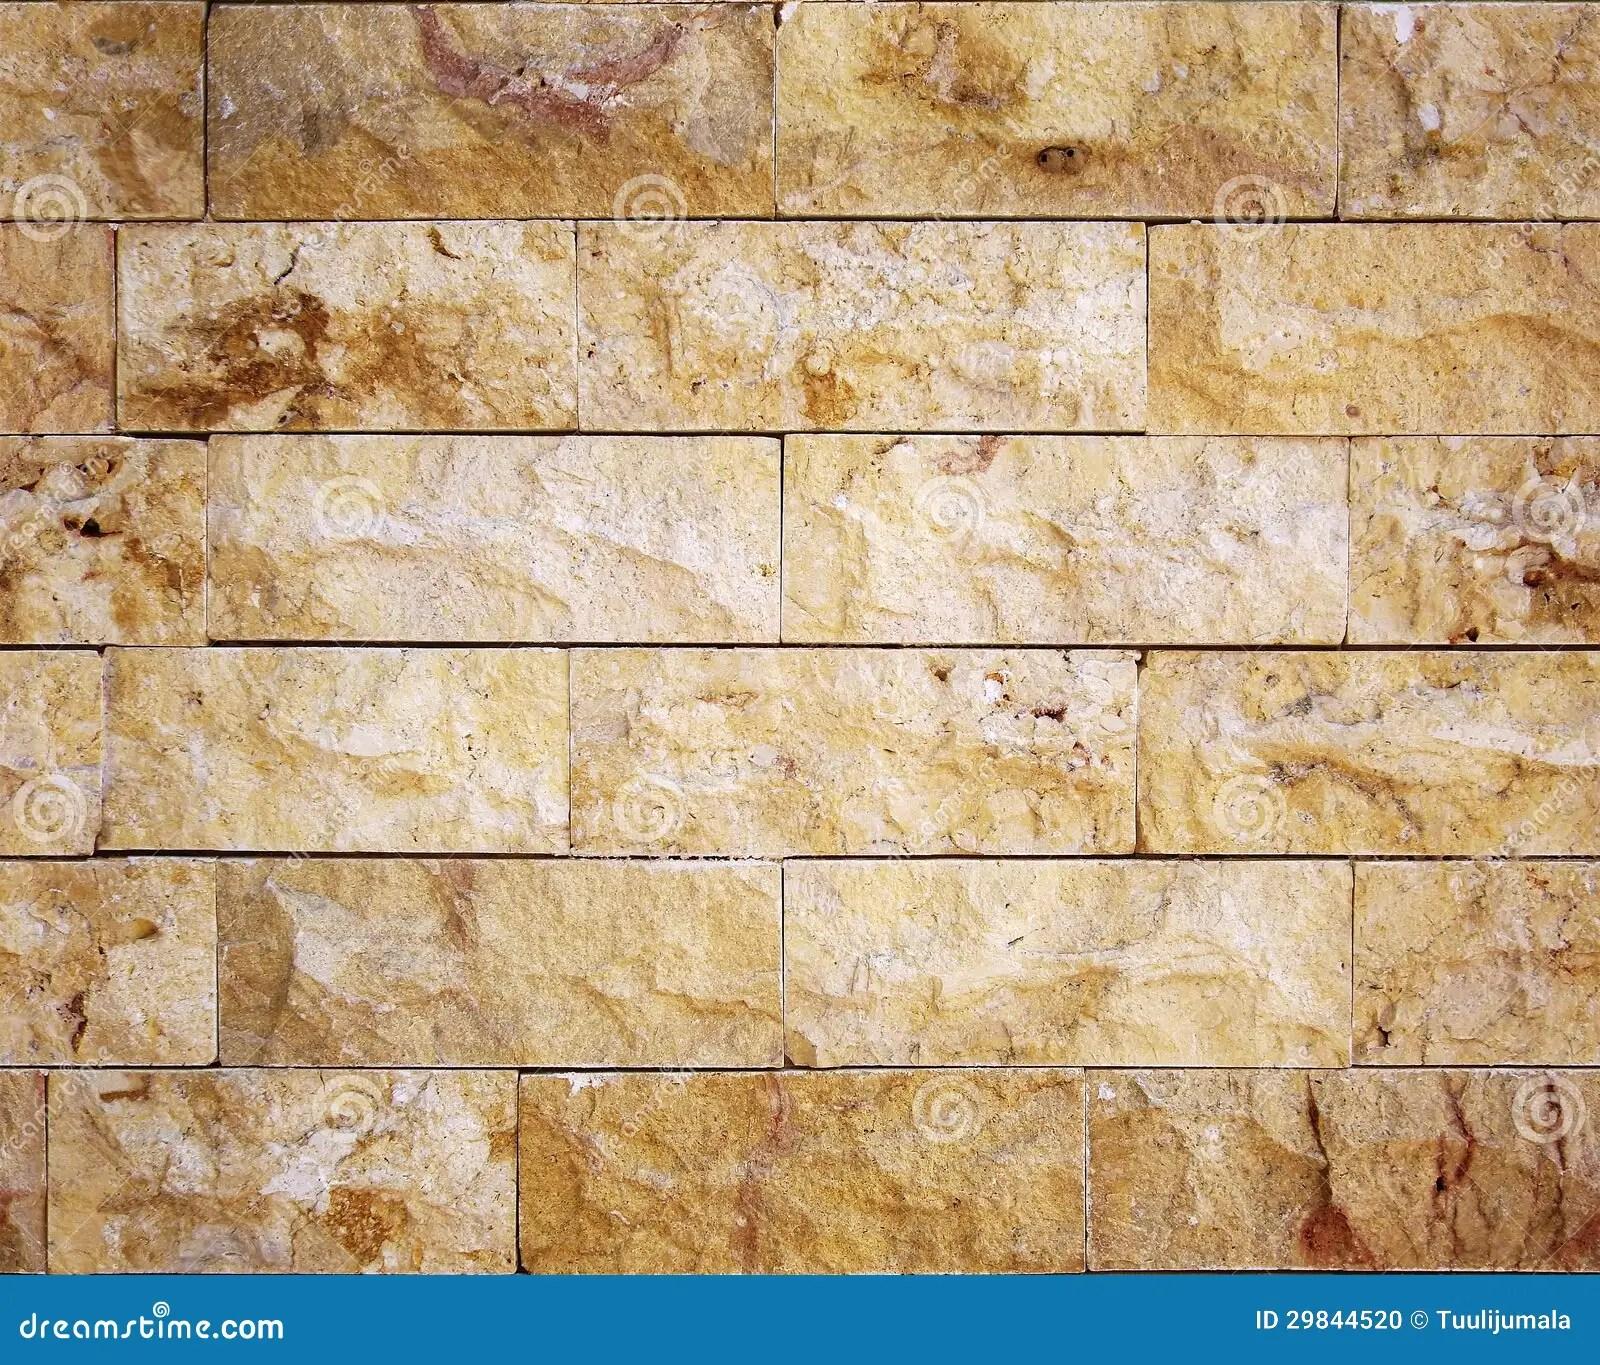 Seamless Facing Stone Texture Stock Photo  Image of